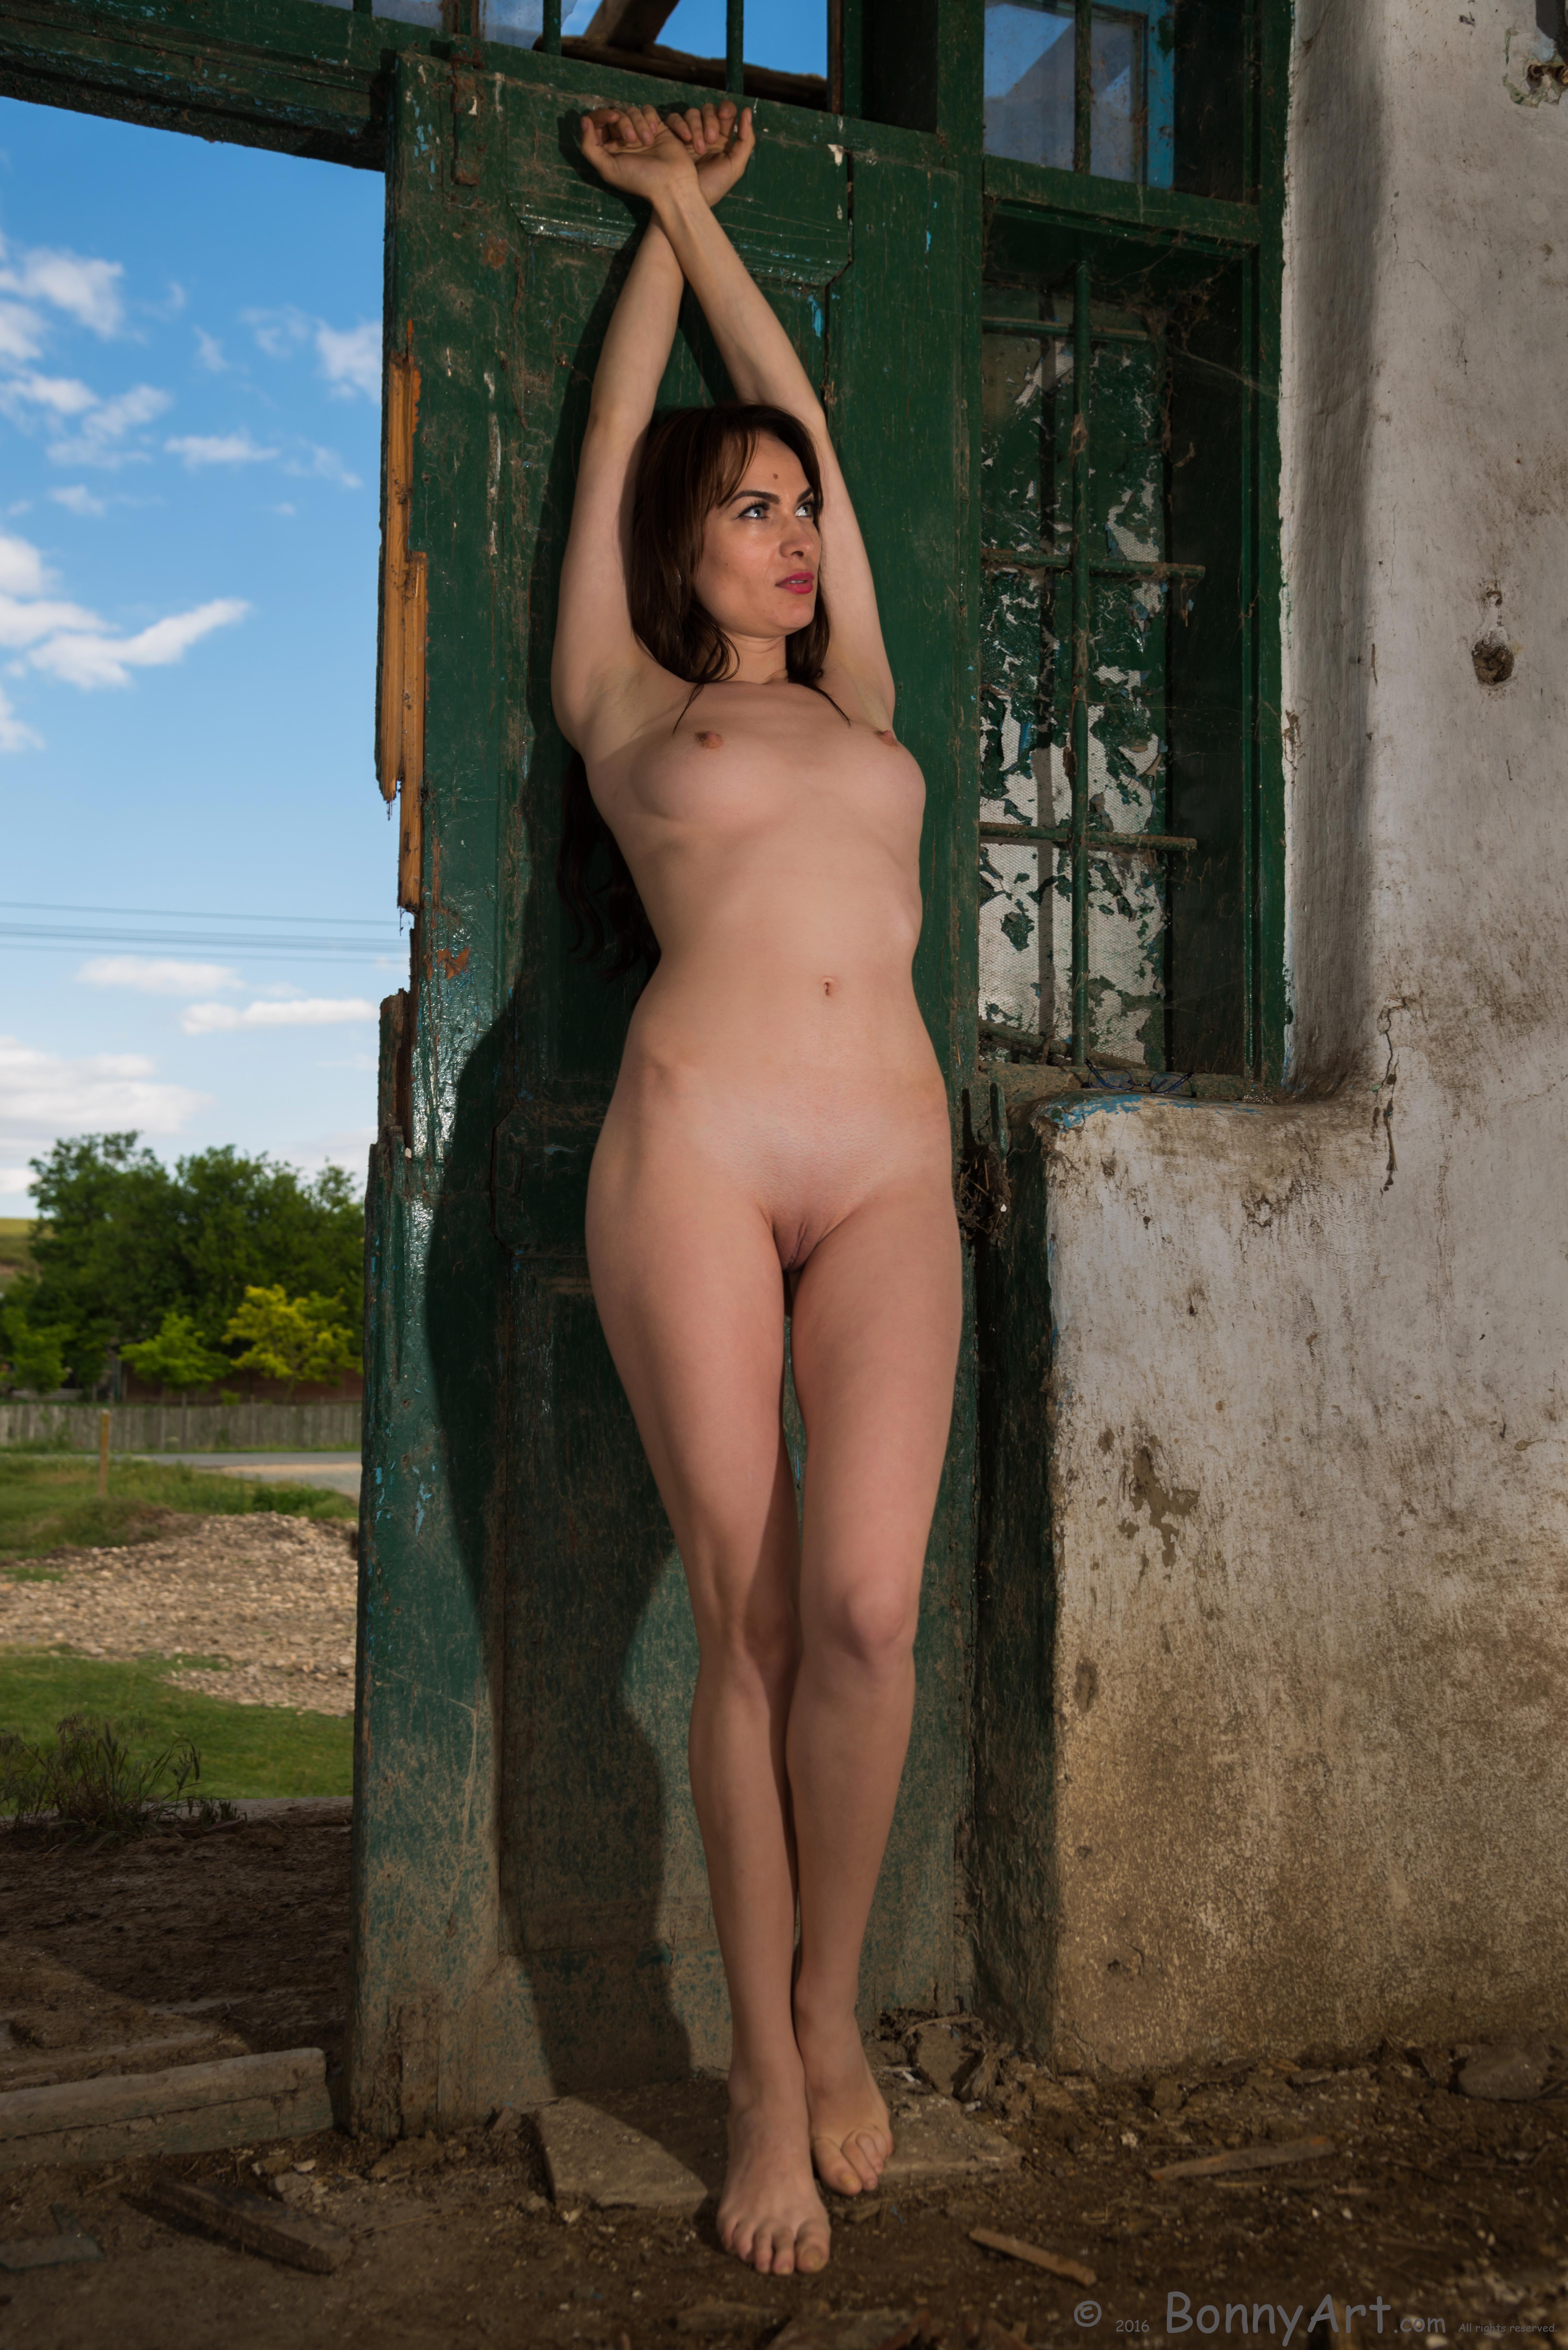 naked girls weed pics free